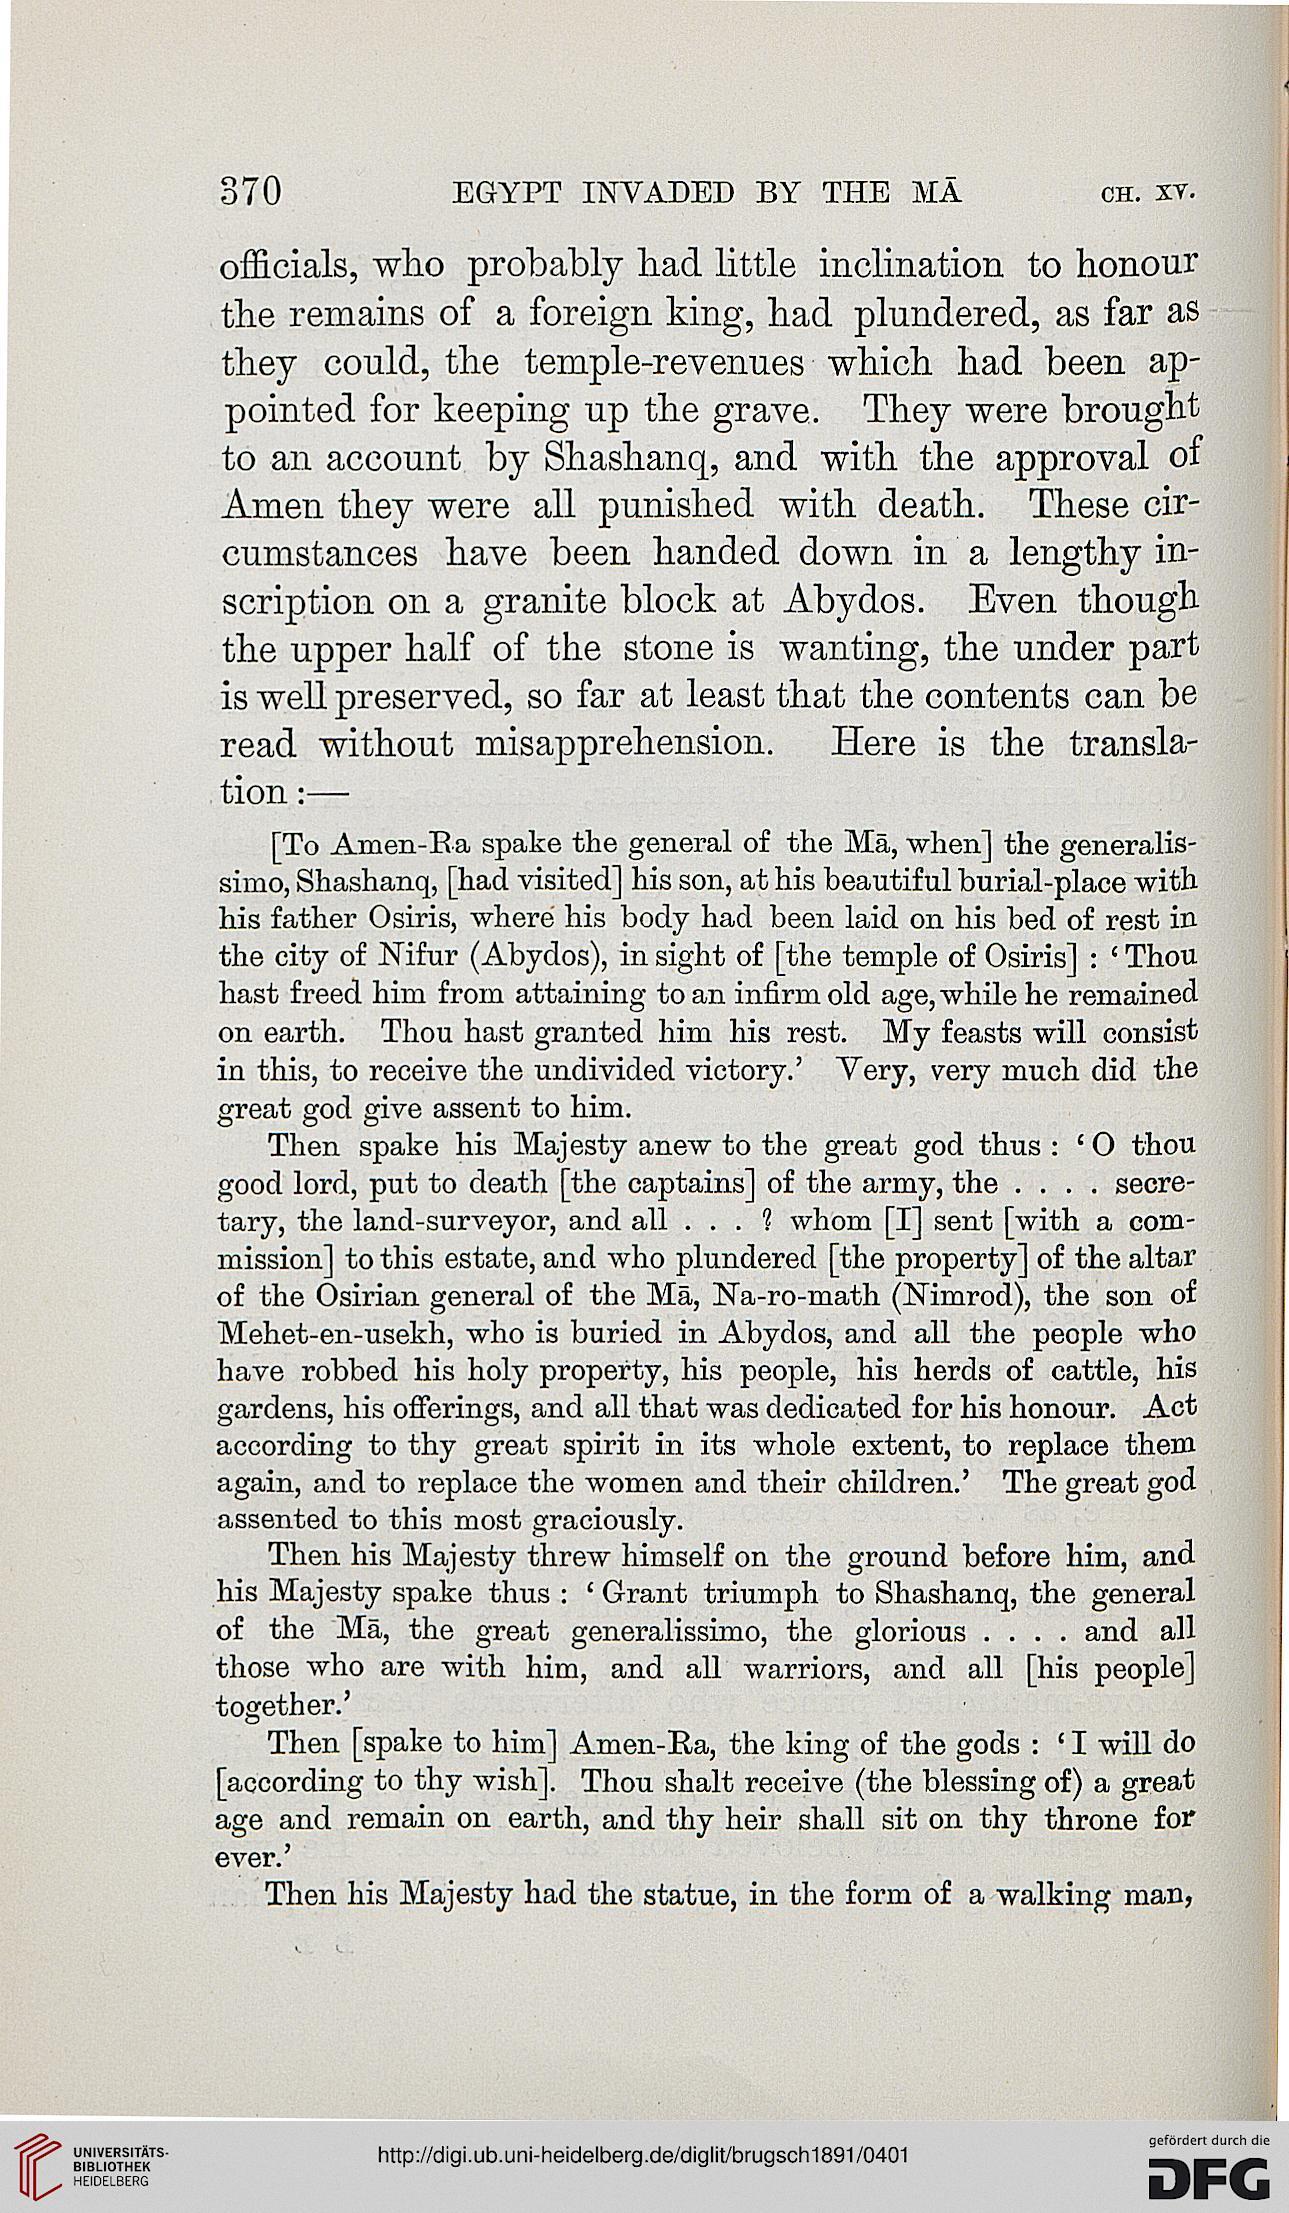 Brugsch, Heinrich: Egypt under the pharaohs: a history derived